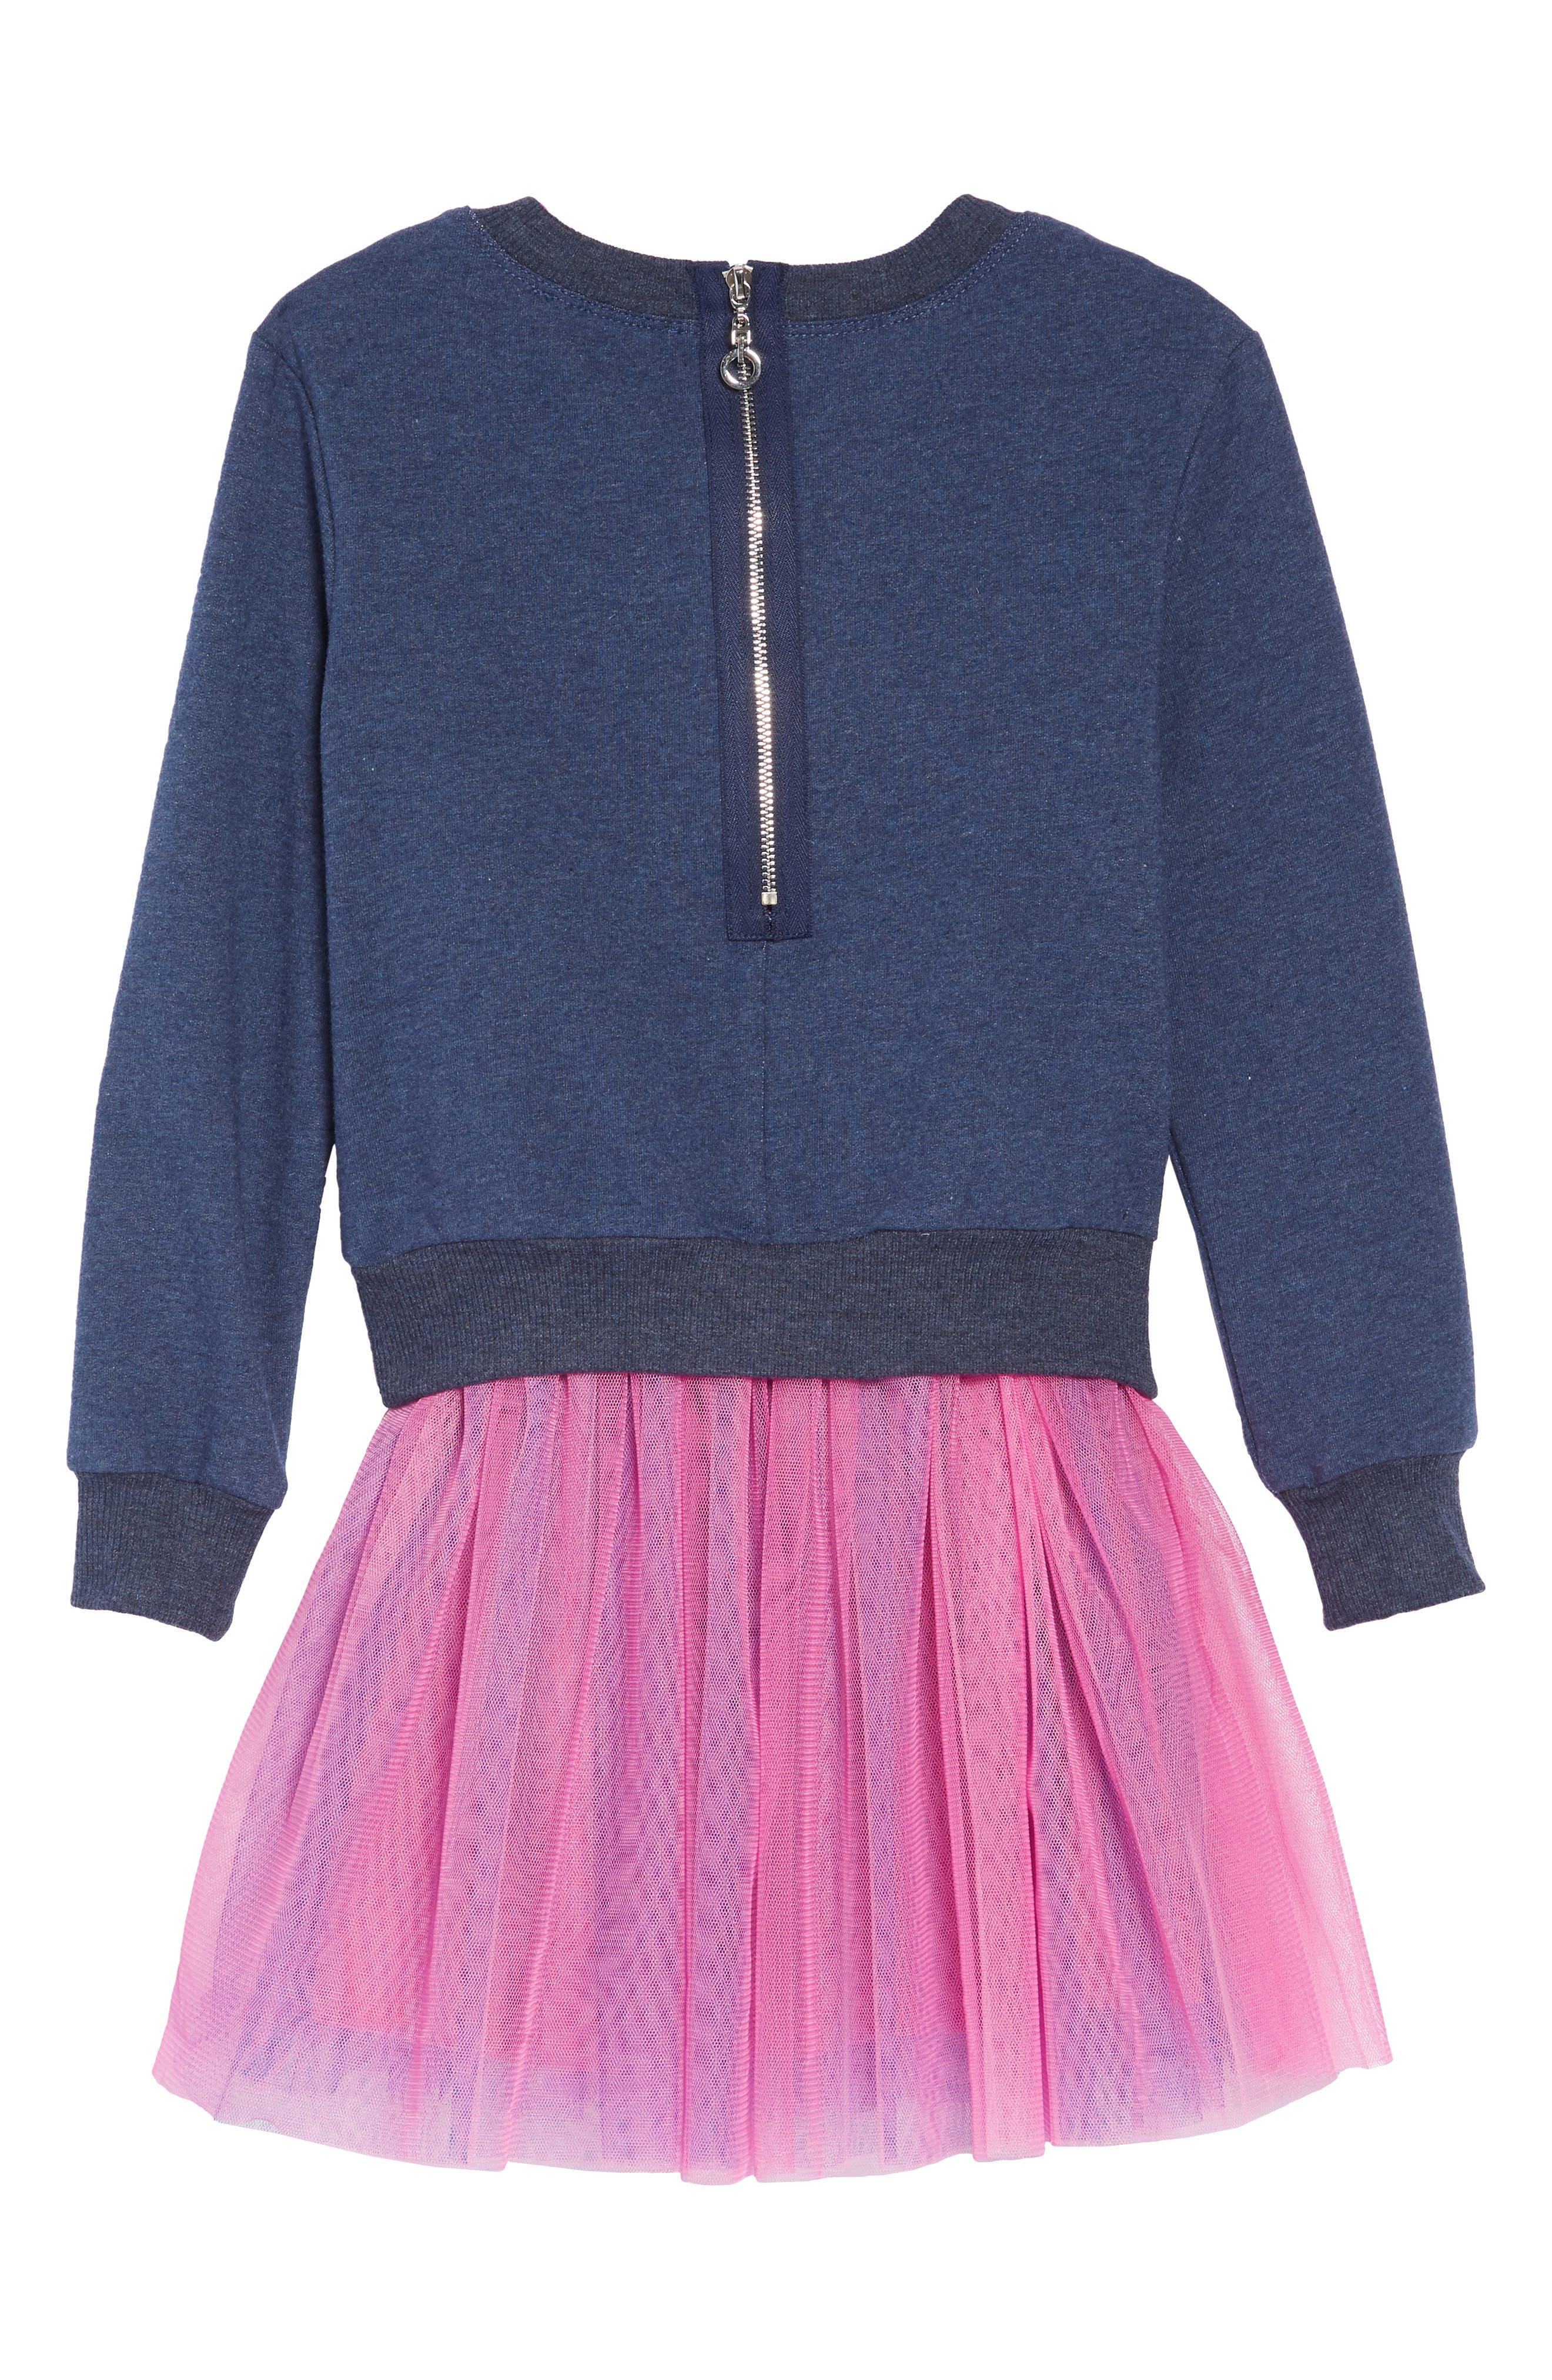 Appliqué Top & Tutu Dress Set,                             Alternate thumbnail 3, color,                             NAVY-PINK